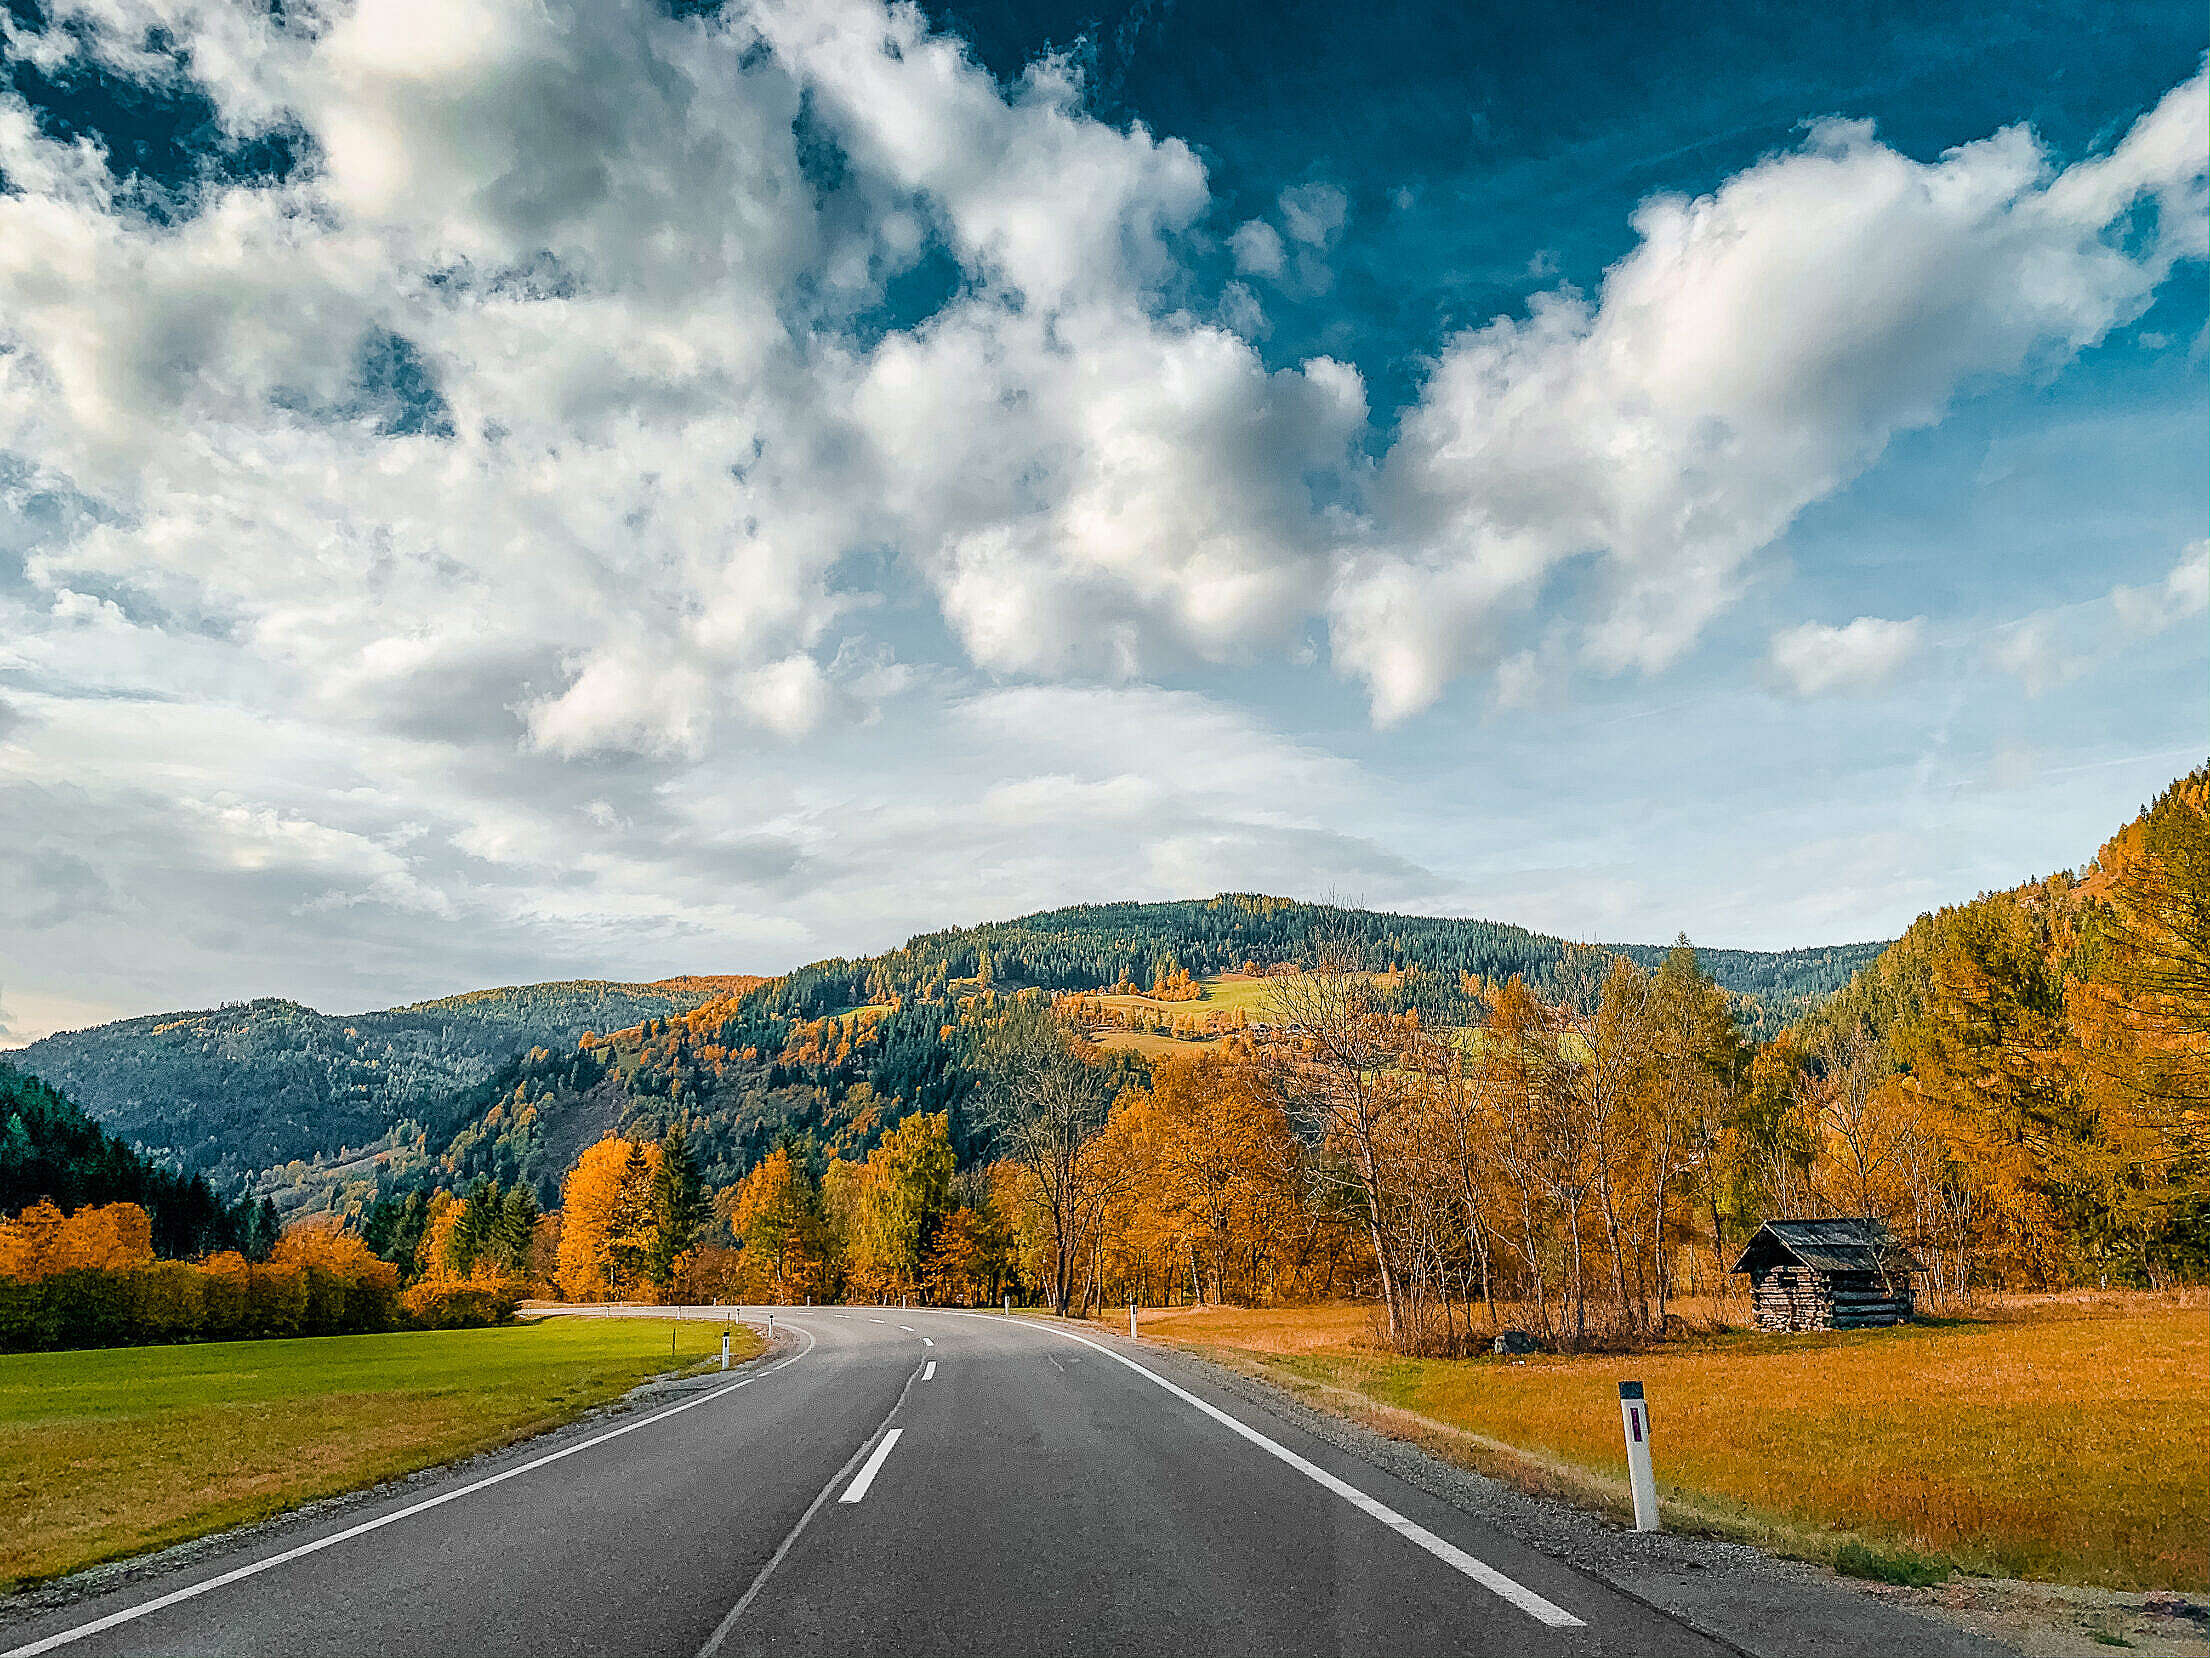 Beautiful Autumn Road in Austria Free Stock Photo